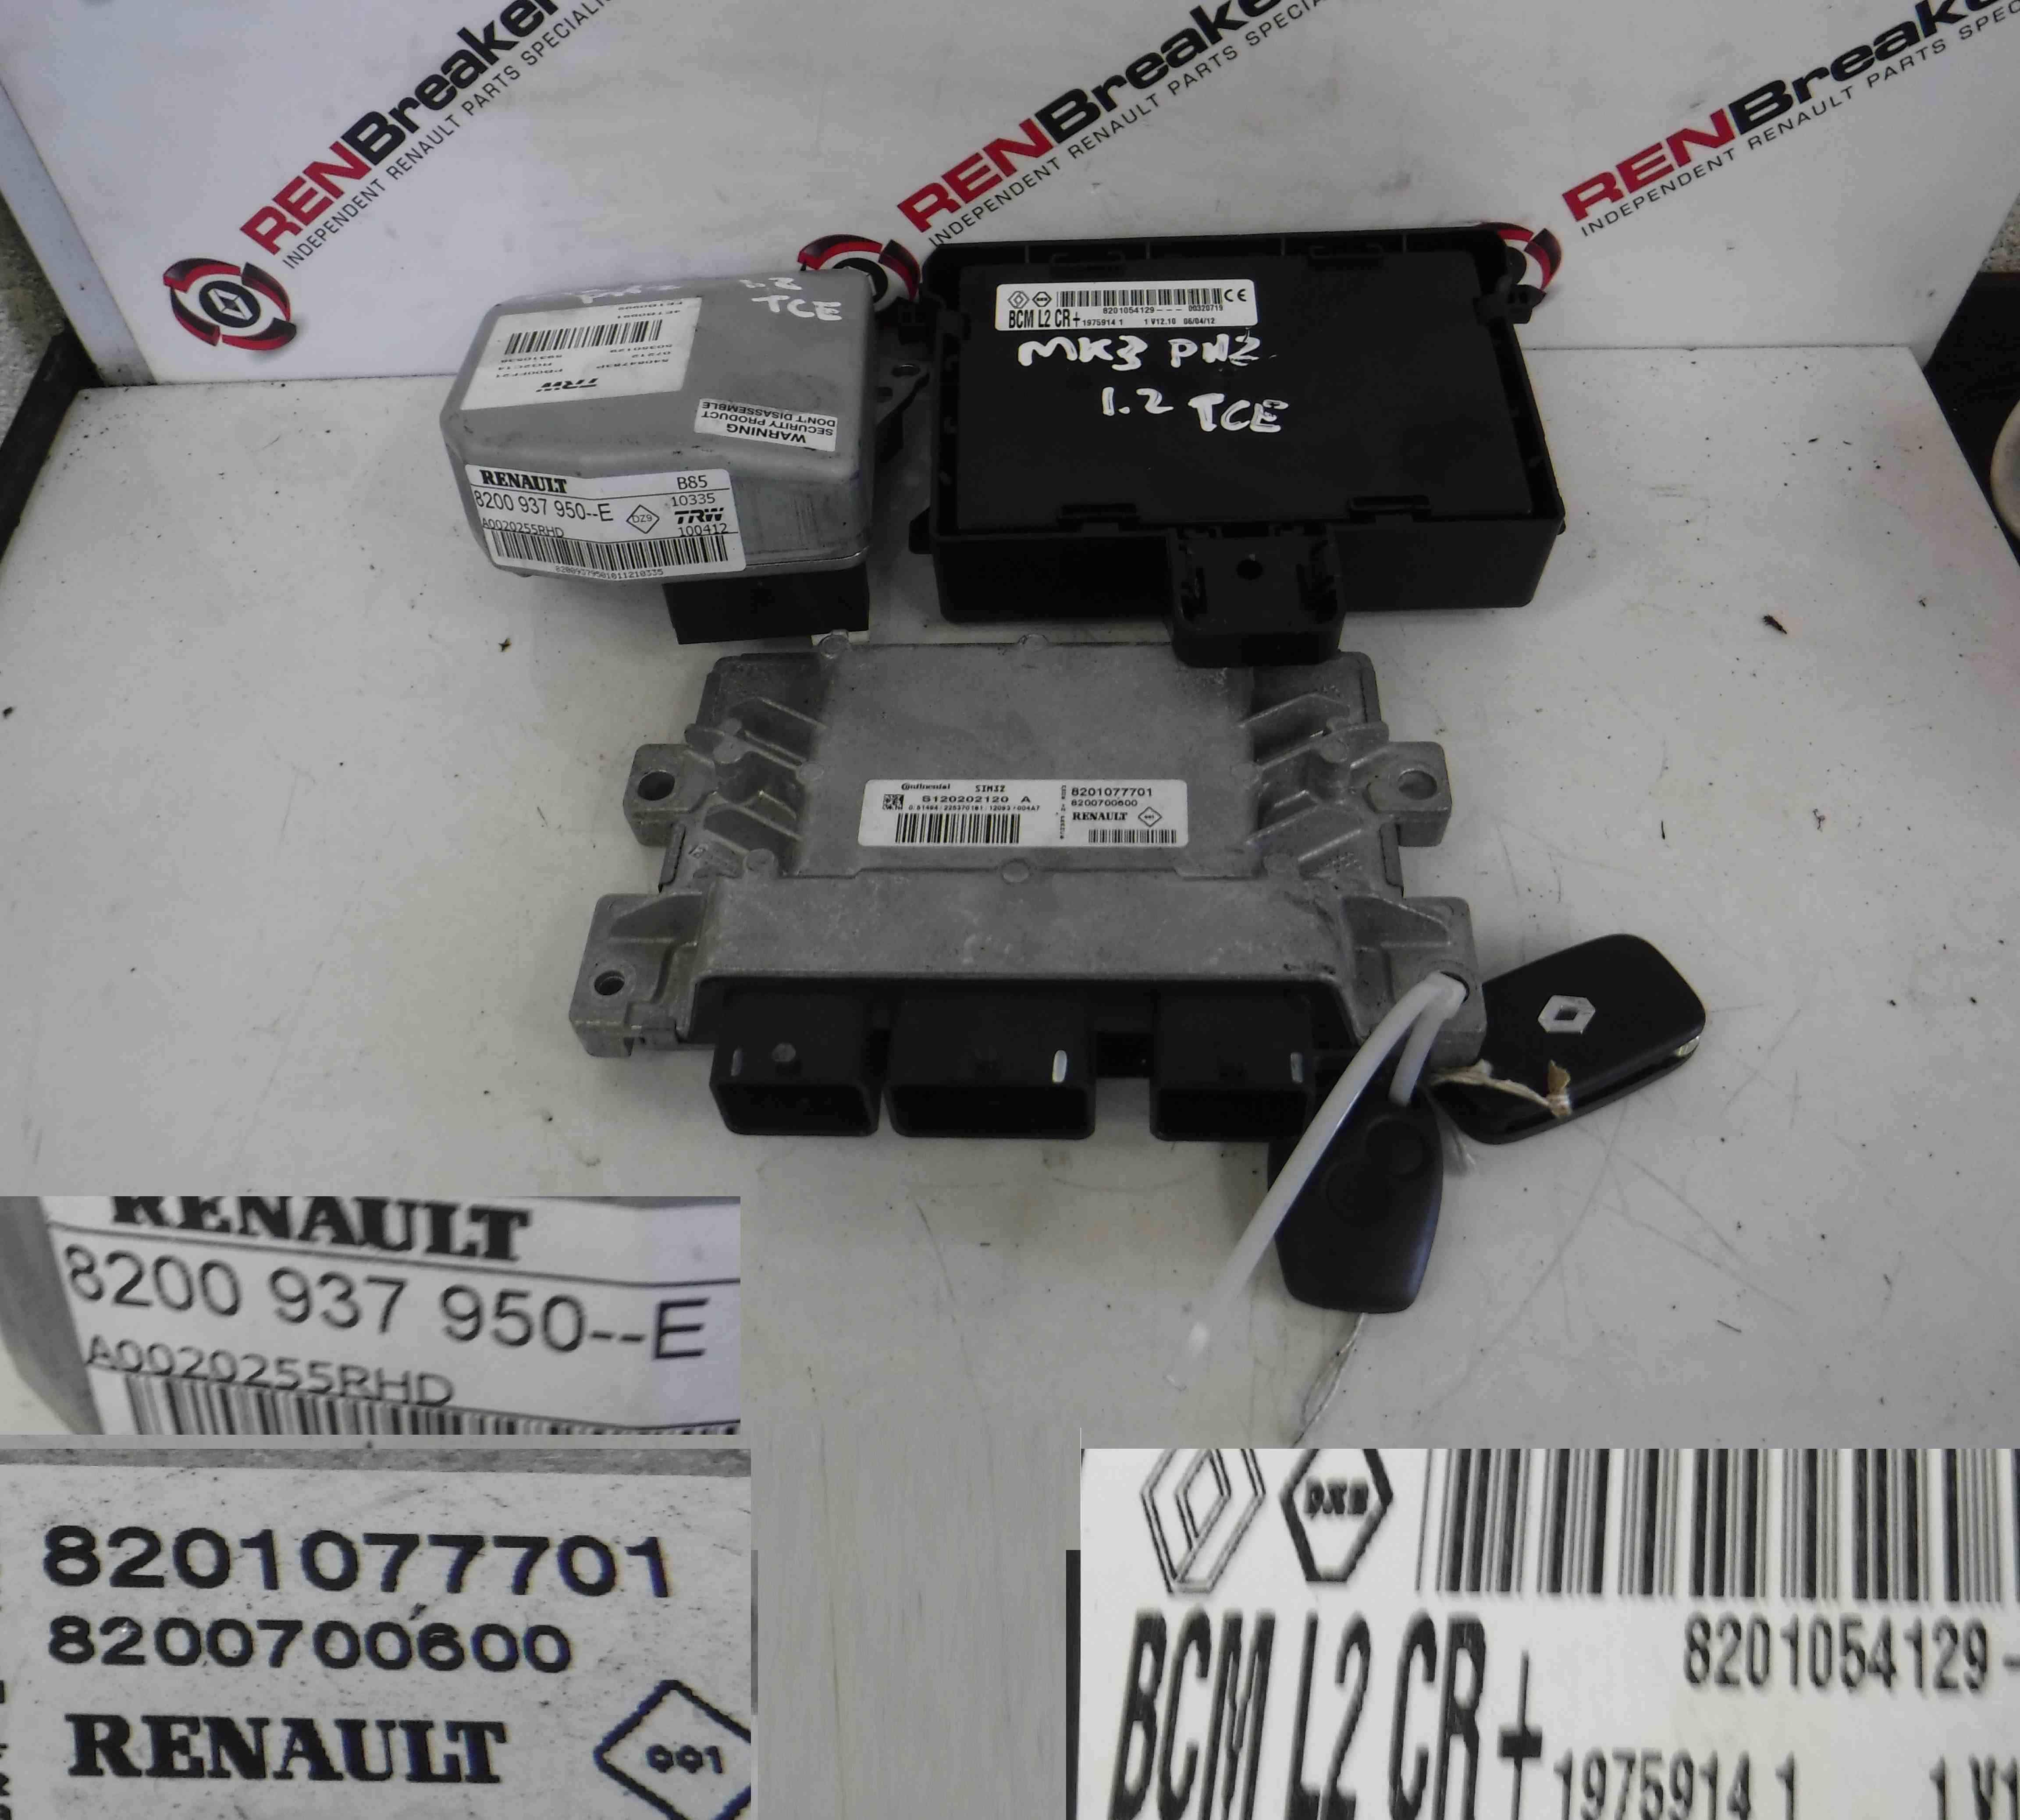 Renault Clio Mk3 2005 2012 12 Turbo Tce Ecu Set Uch Bcm Steering Fuse Box 2 Keys